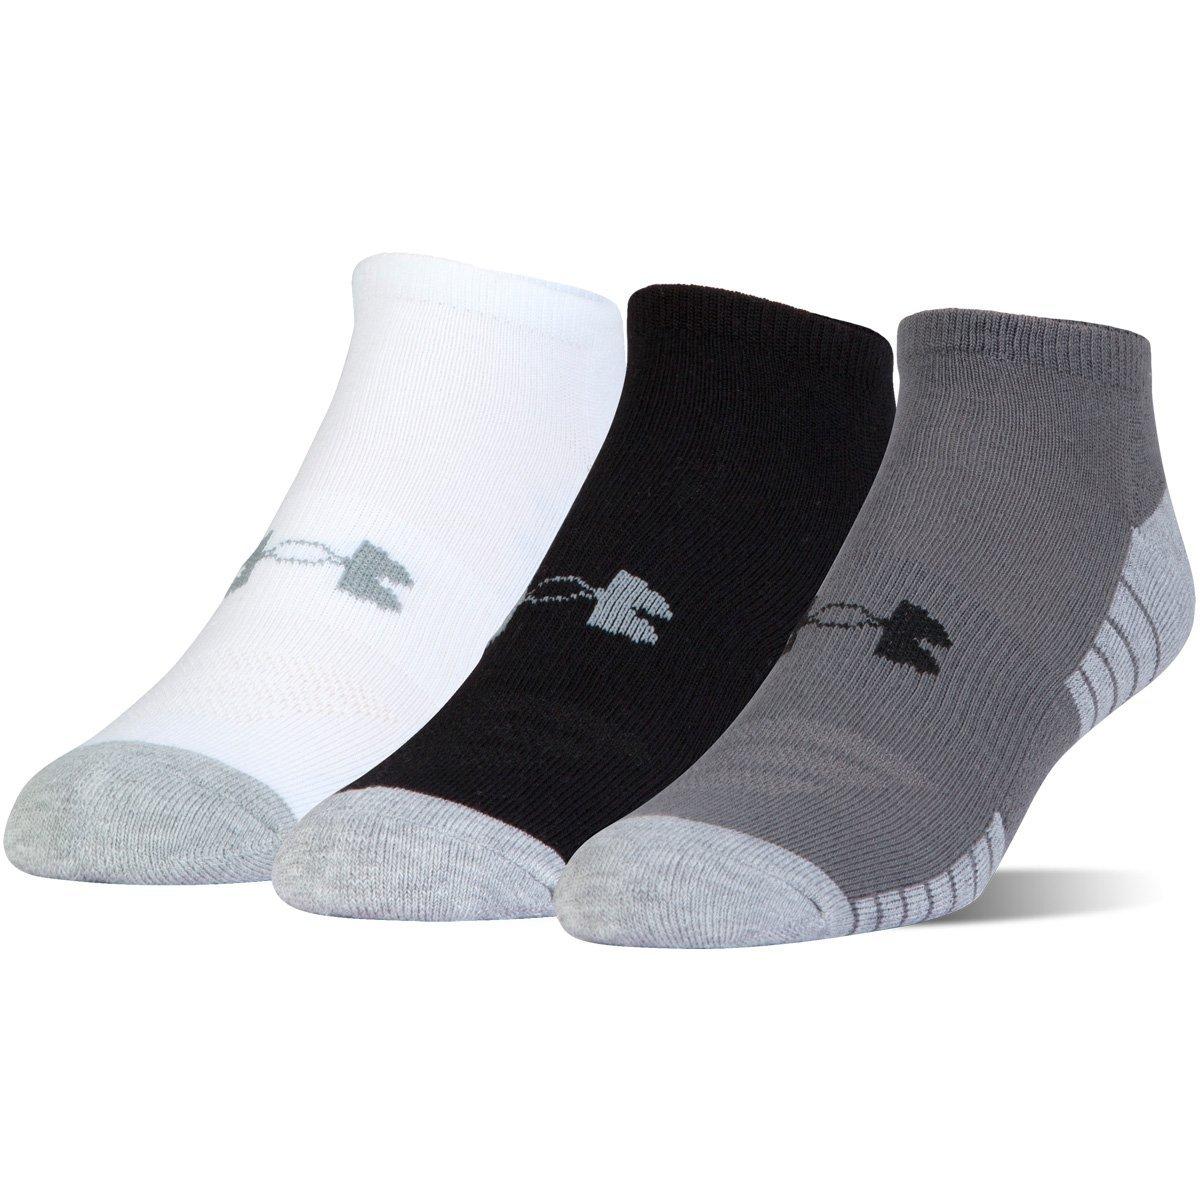 Under Armour Heatgear Tech Noshow 3Pk Unisex Socks 1312439